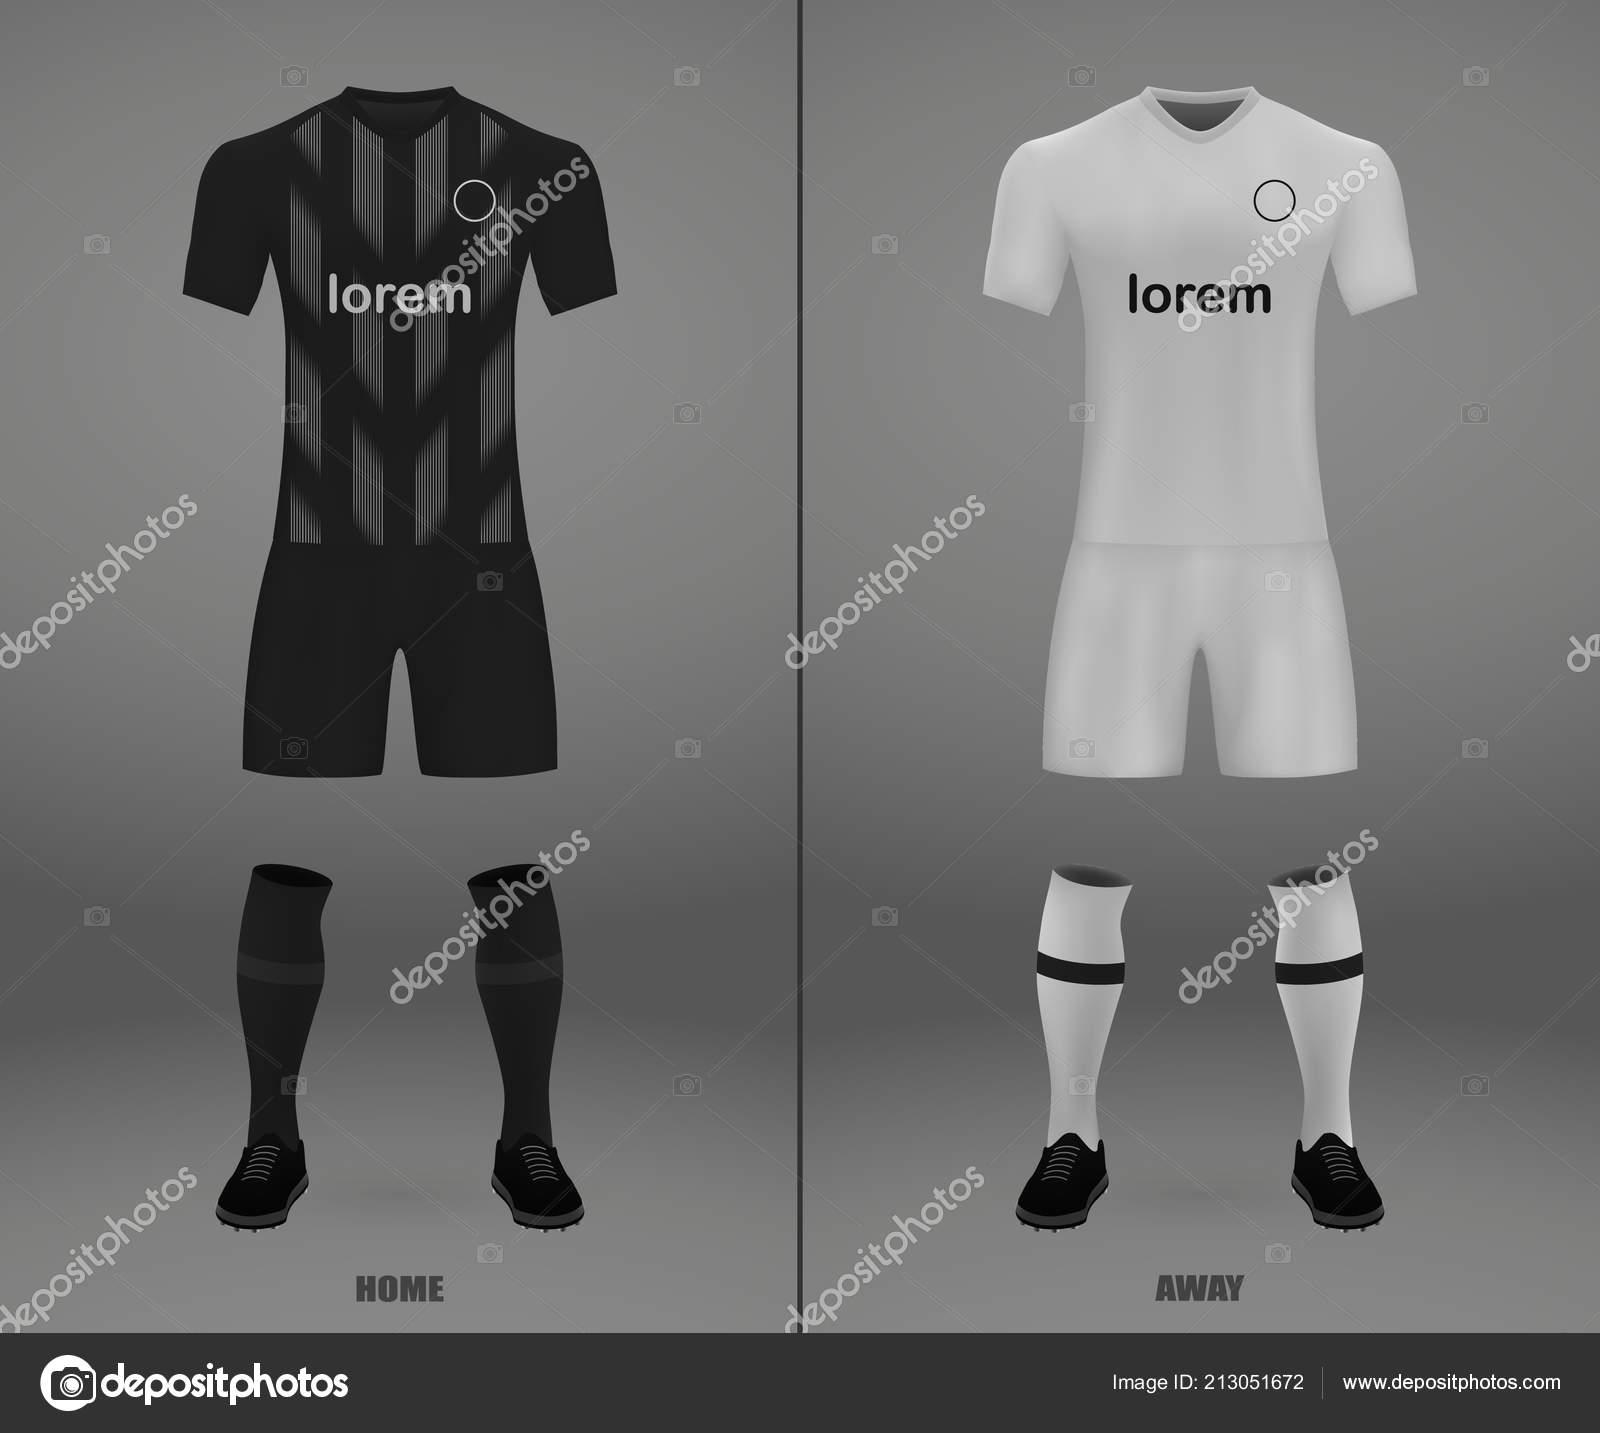 1fdabb75b3 Kit Futebol Eintracht Frankfurt 2018 Modelo Camisa Para Futebol Jersey —  Vetores de Stock